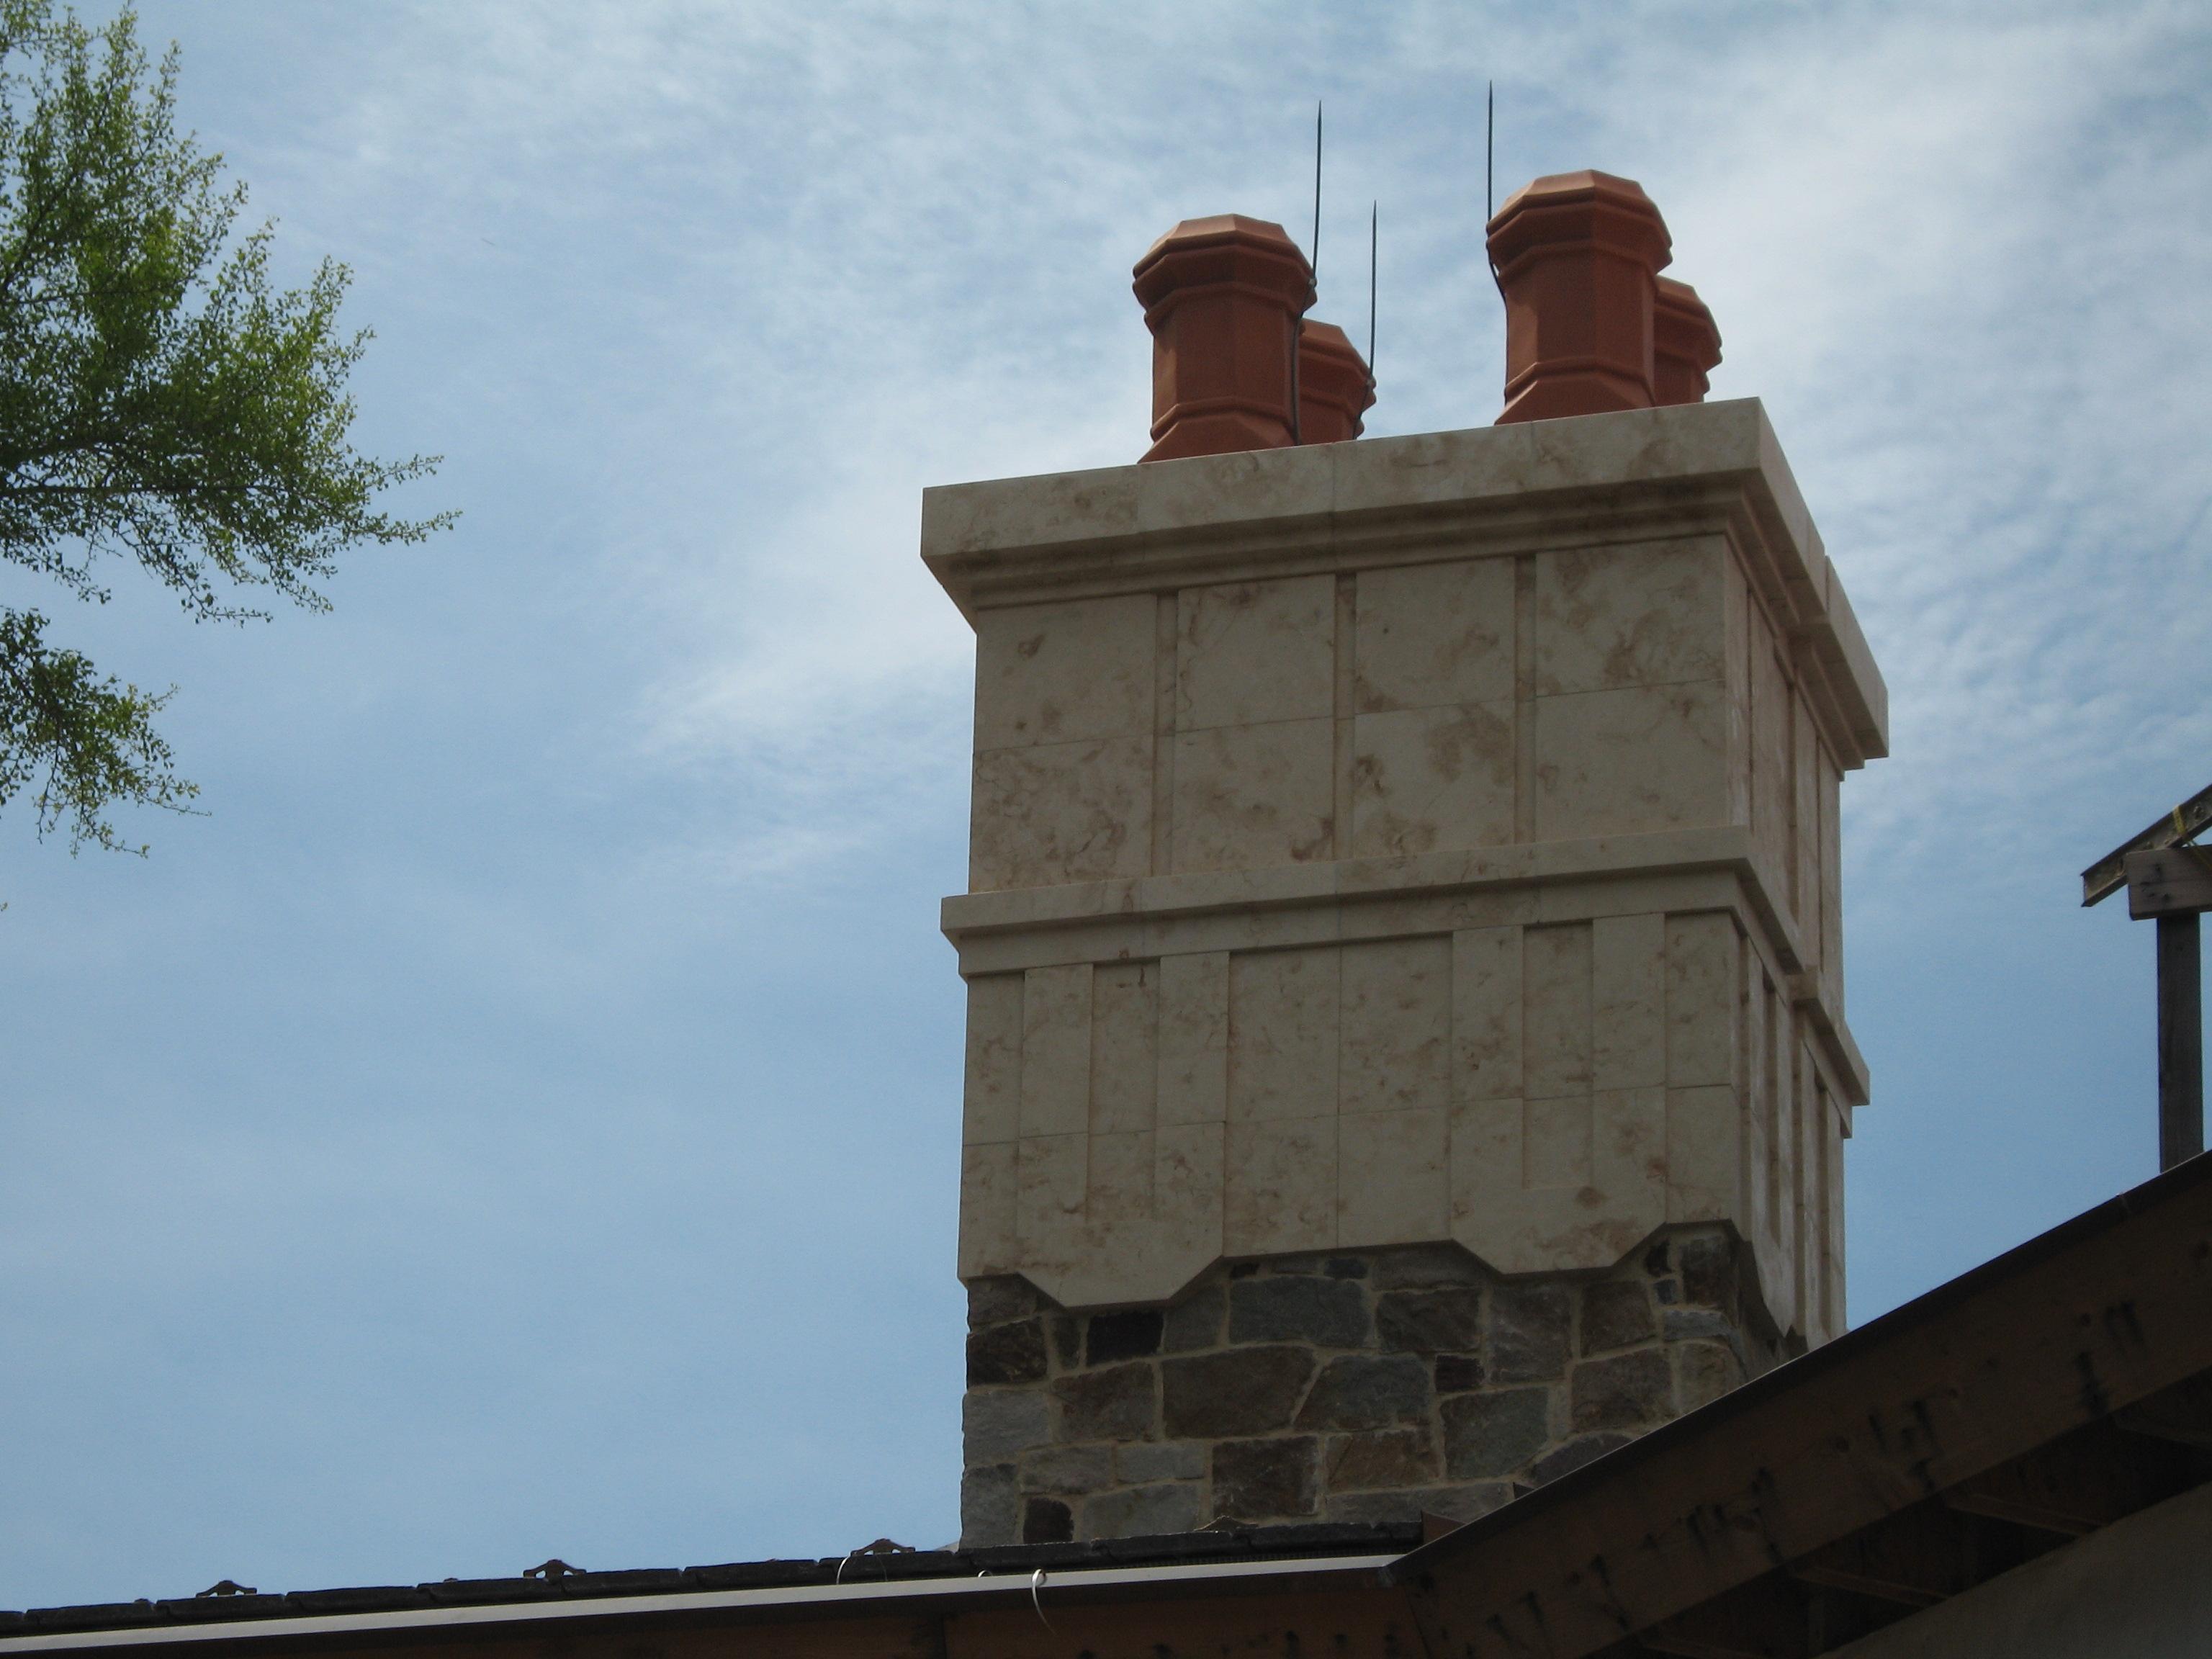 Chimney Cap with Claypots